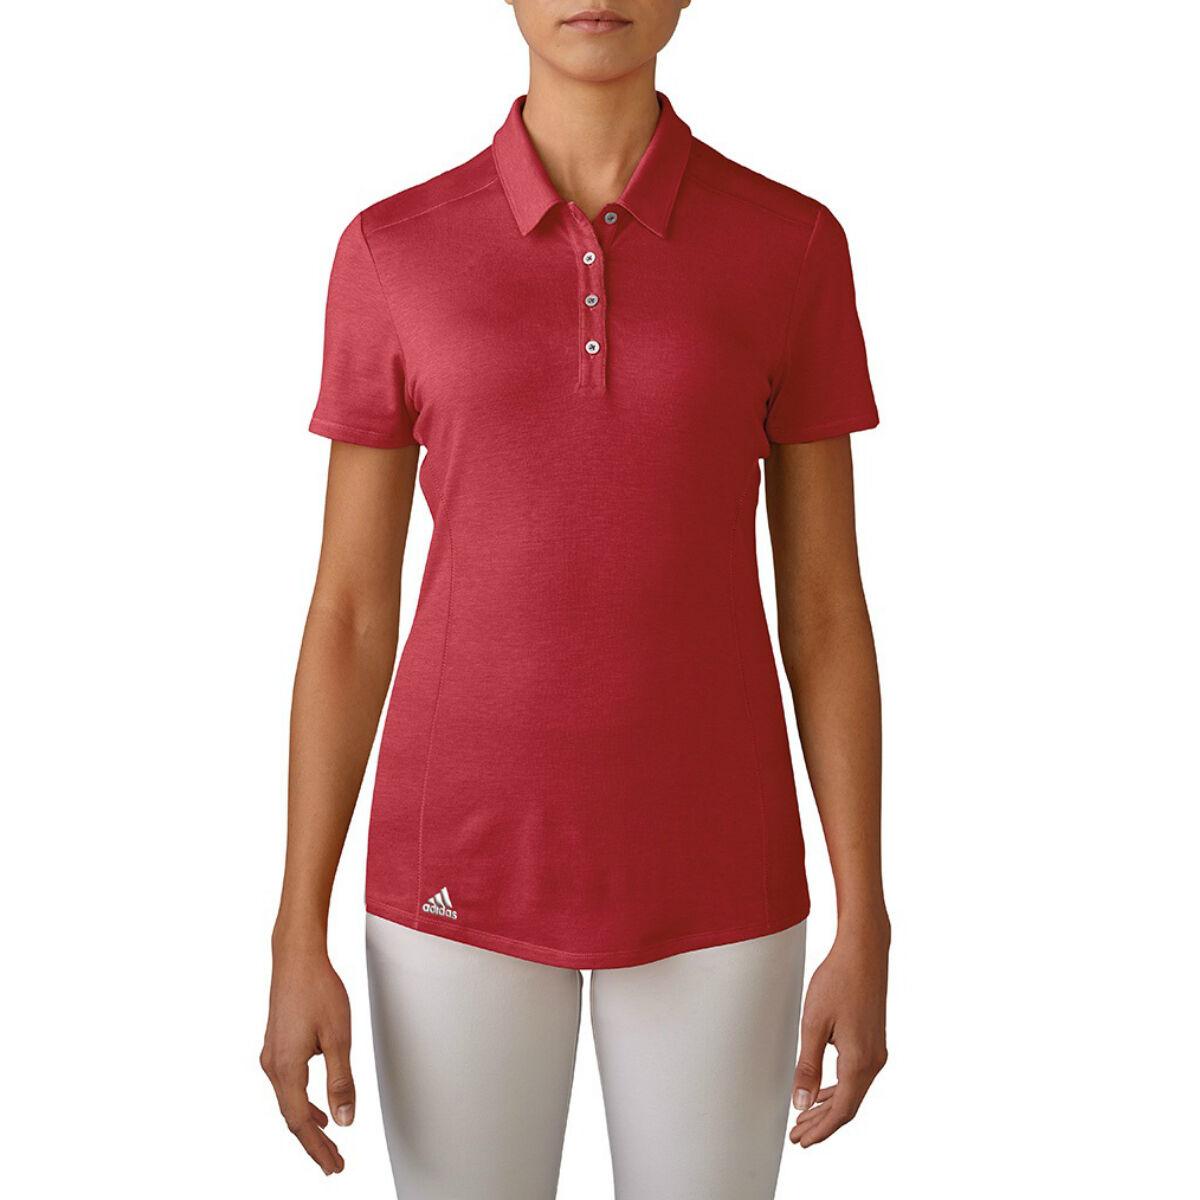 Adidas Golf Polo Ladies (Power Red)